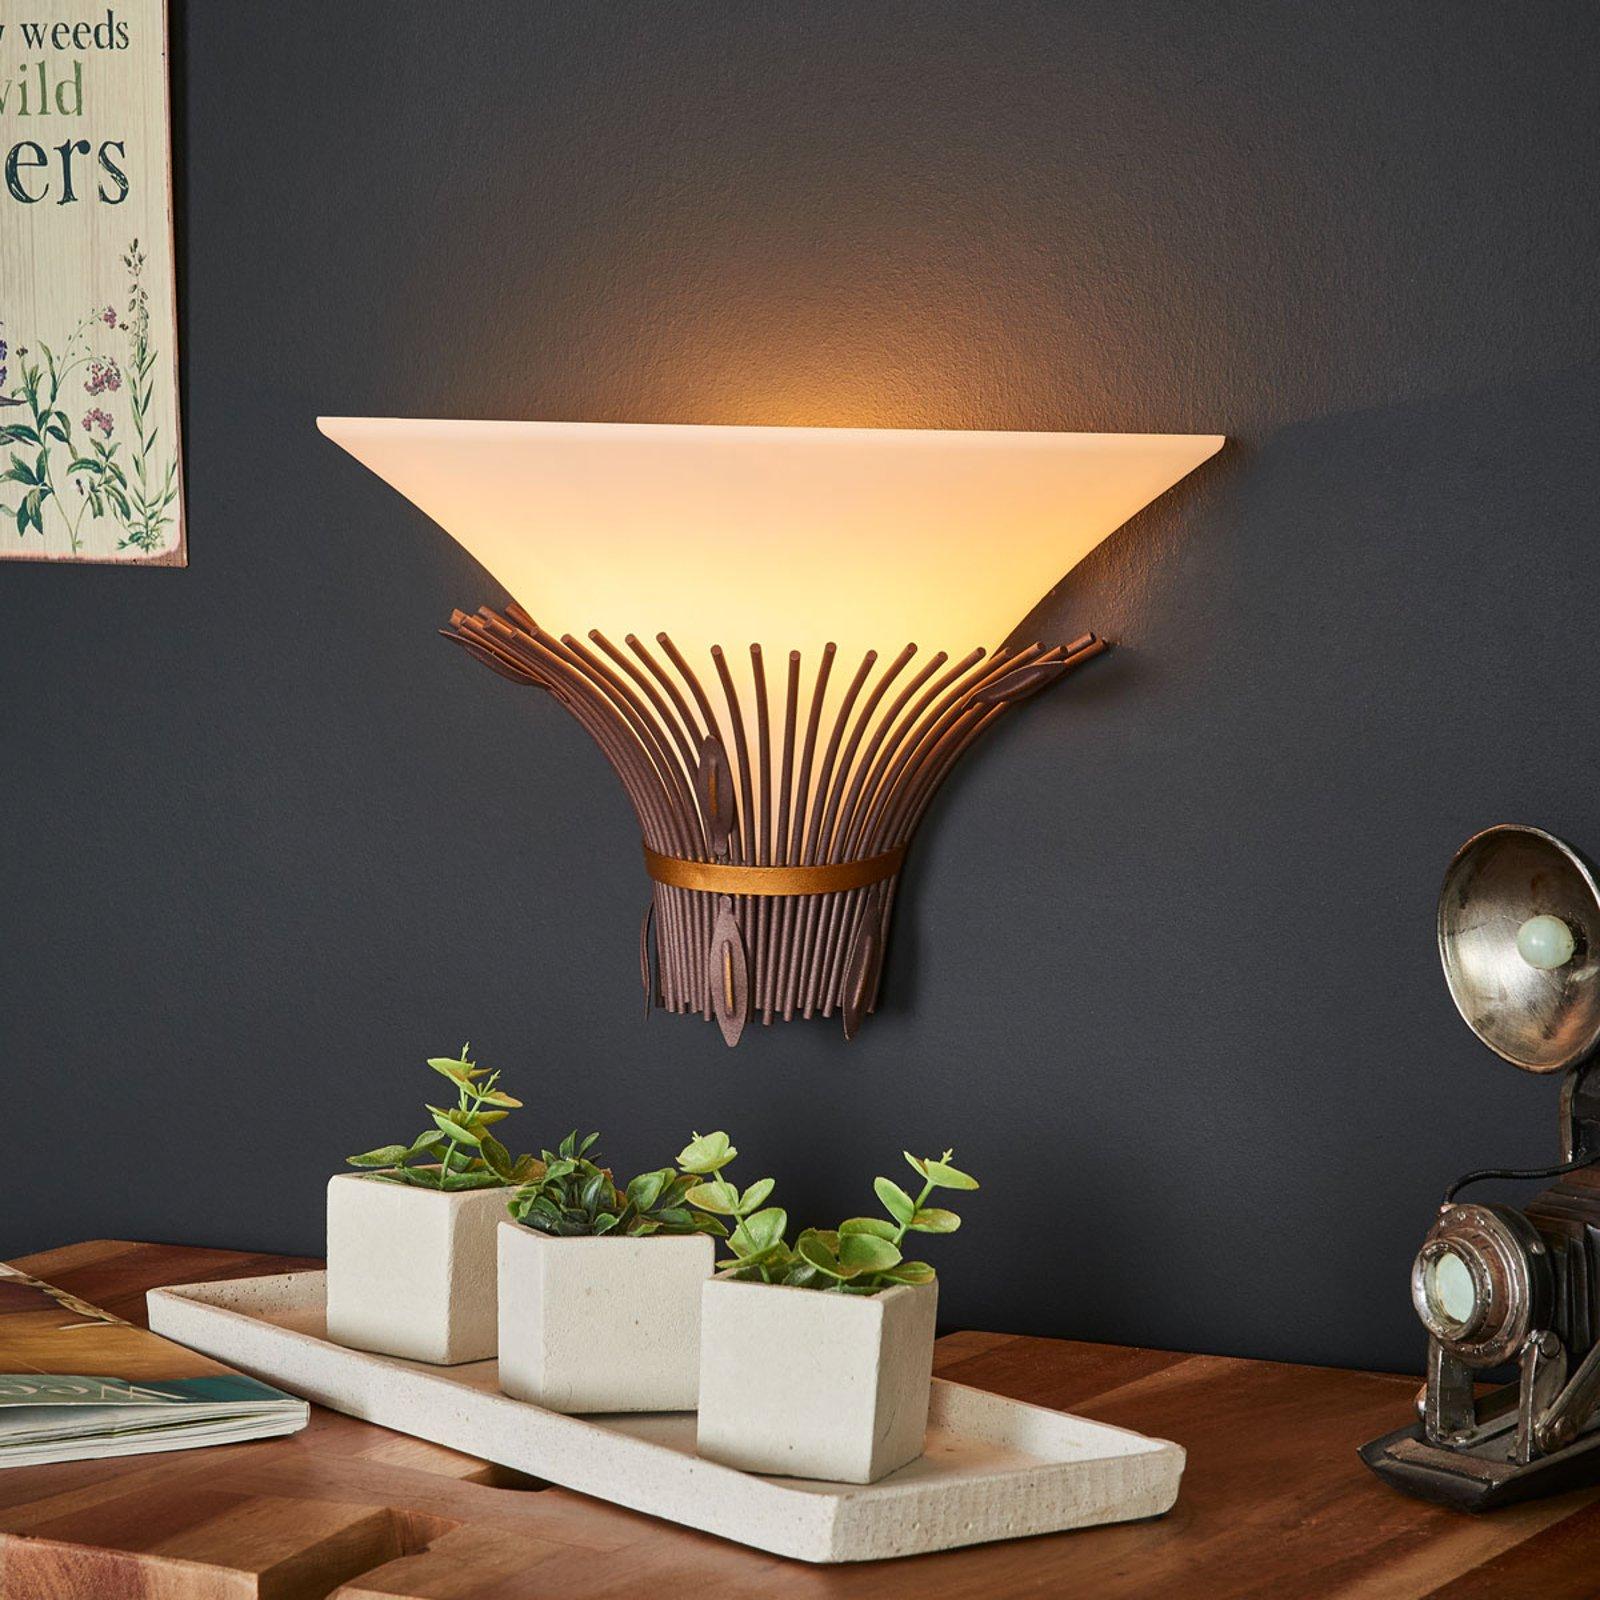 Vegglampe Canna med afrikansk preg